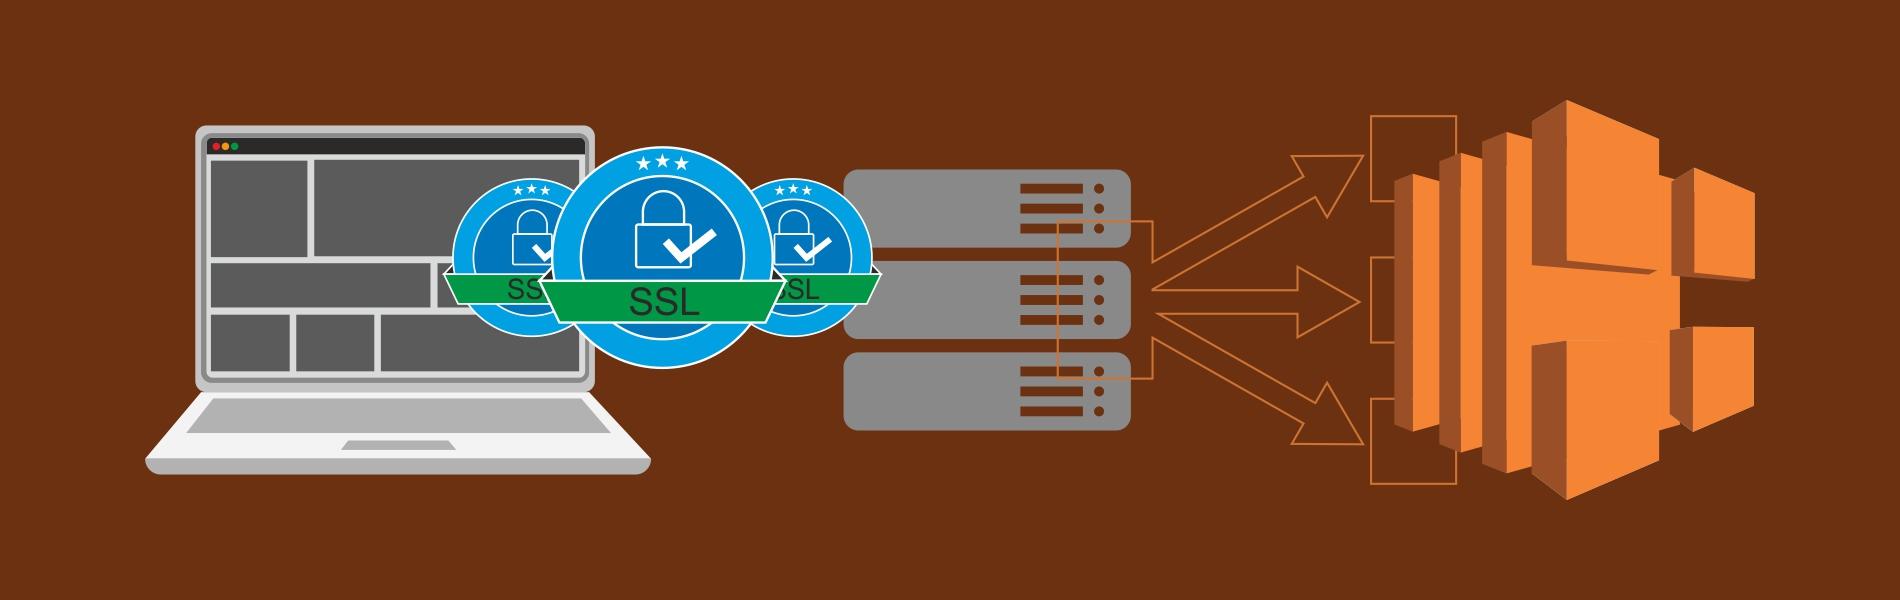 Blog-Header-Adding-multiple-SSL-certificates-on-single-AWS-Elastic-Load-Balancer-ELB